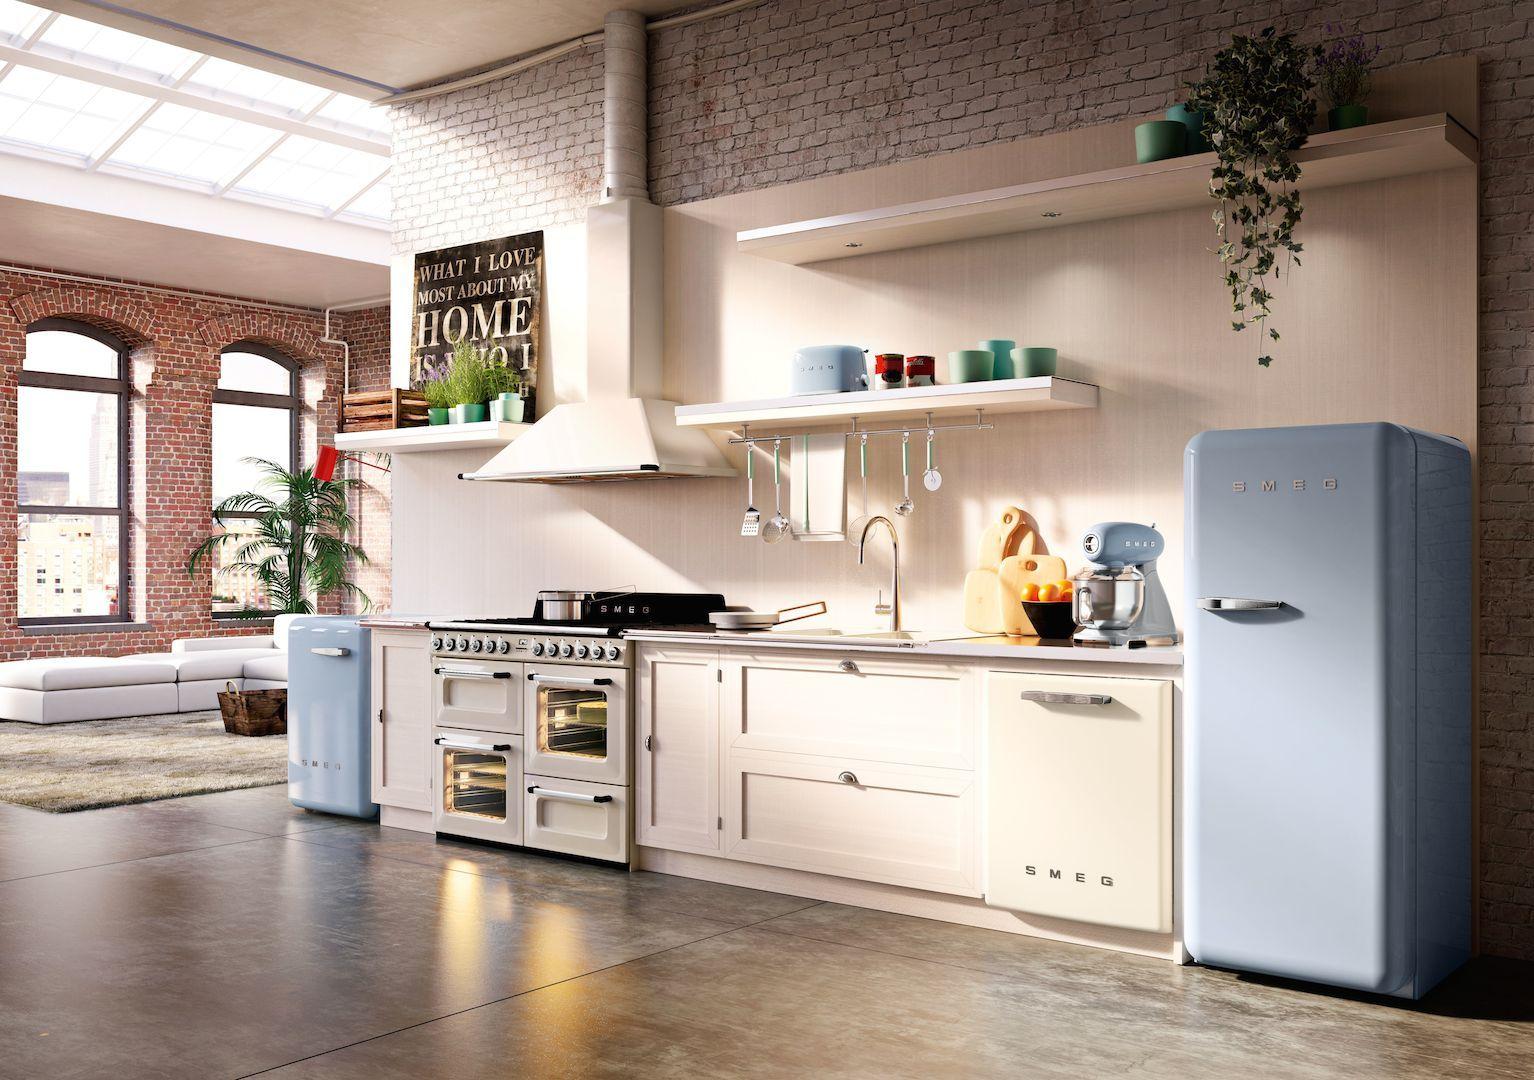 Jaren 50 Keuken : Smeg keukenapparatuur jaren product in beeld startpagina